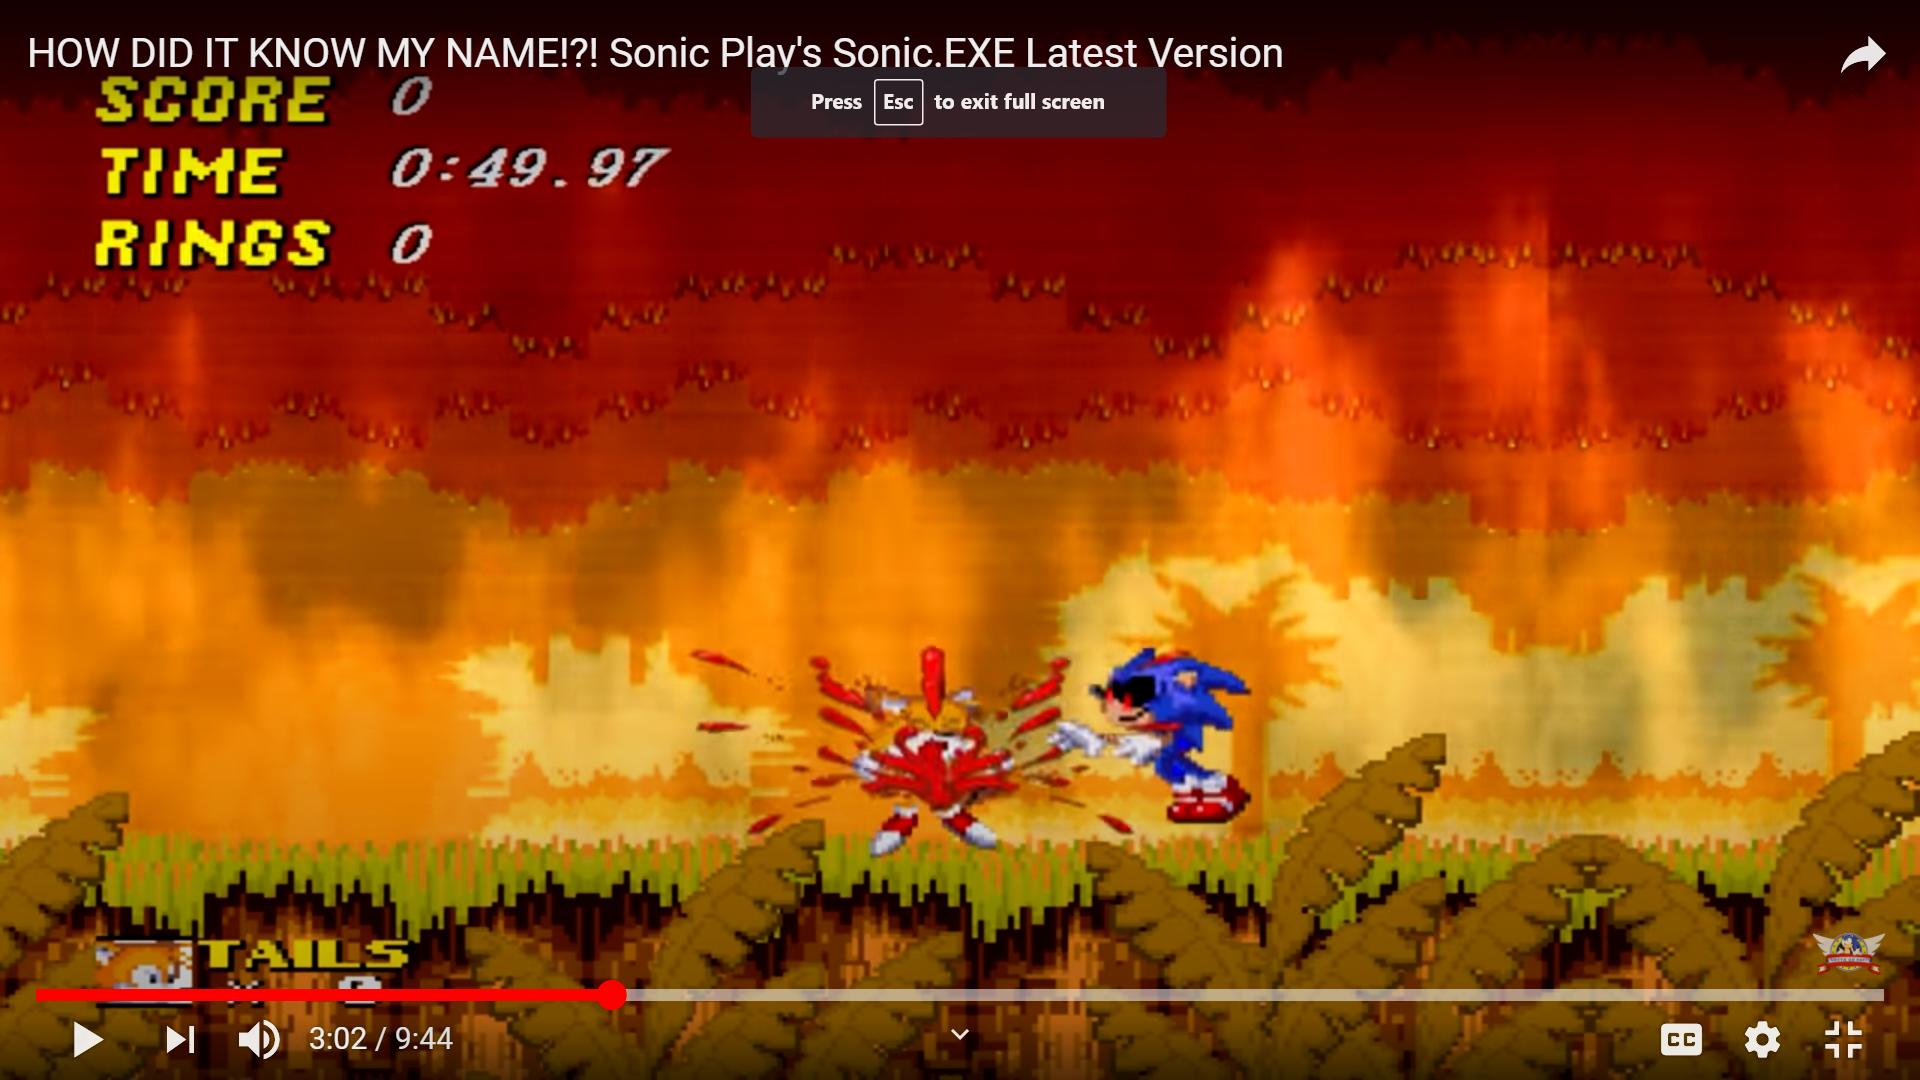 Sonic.exe (SONIC PLAYS)